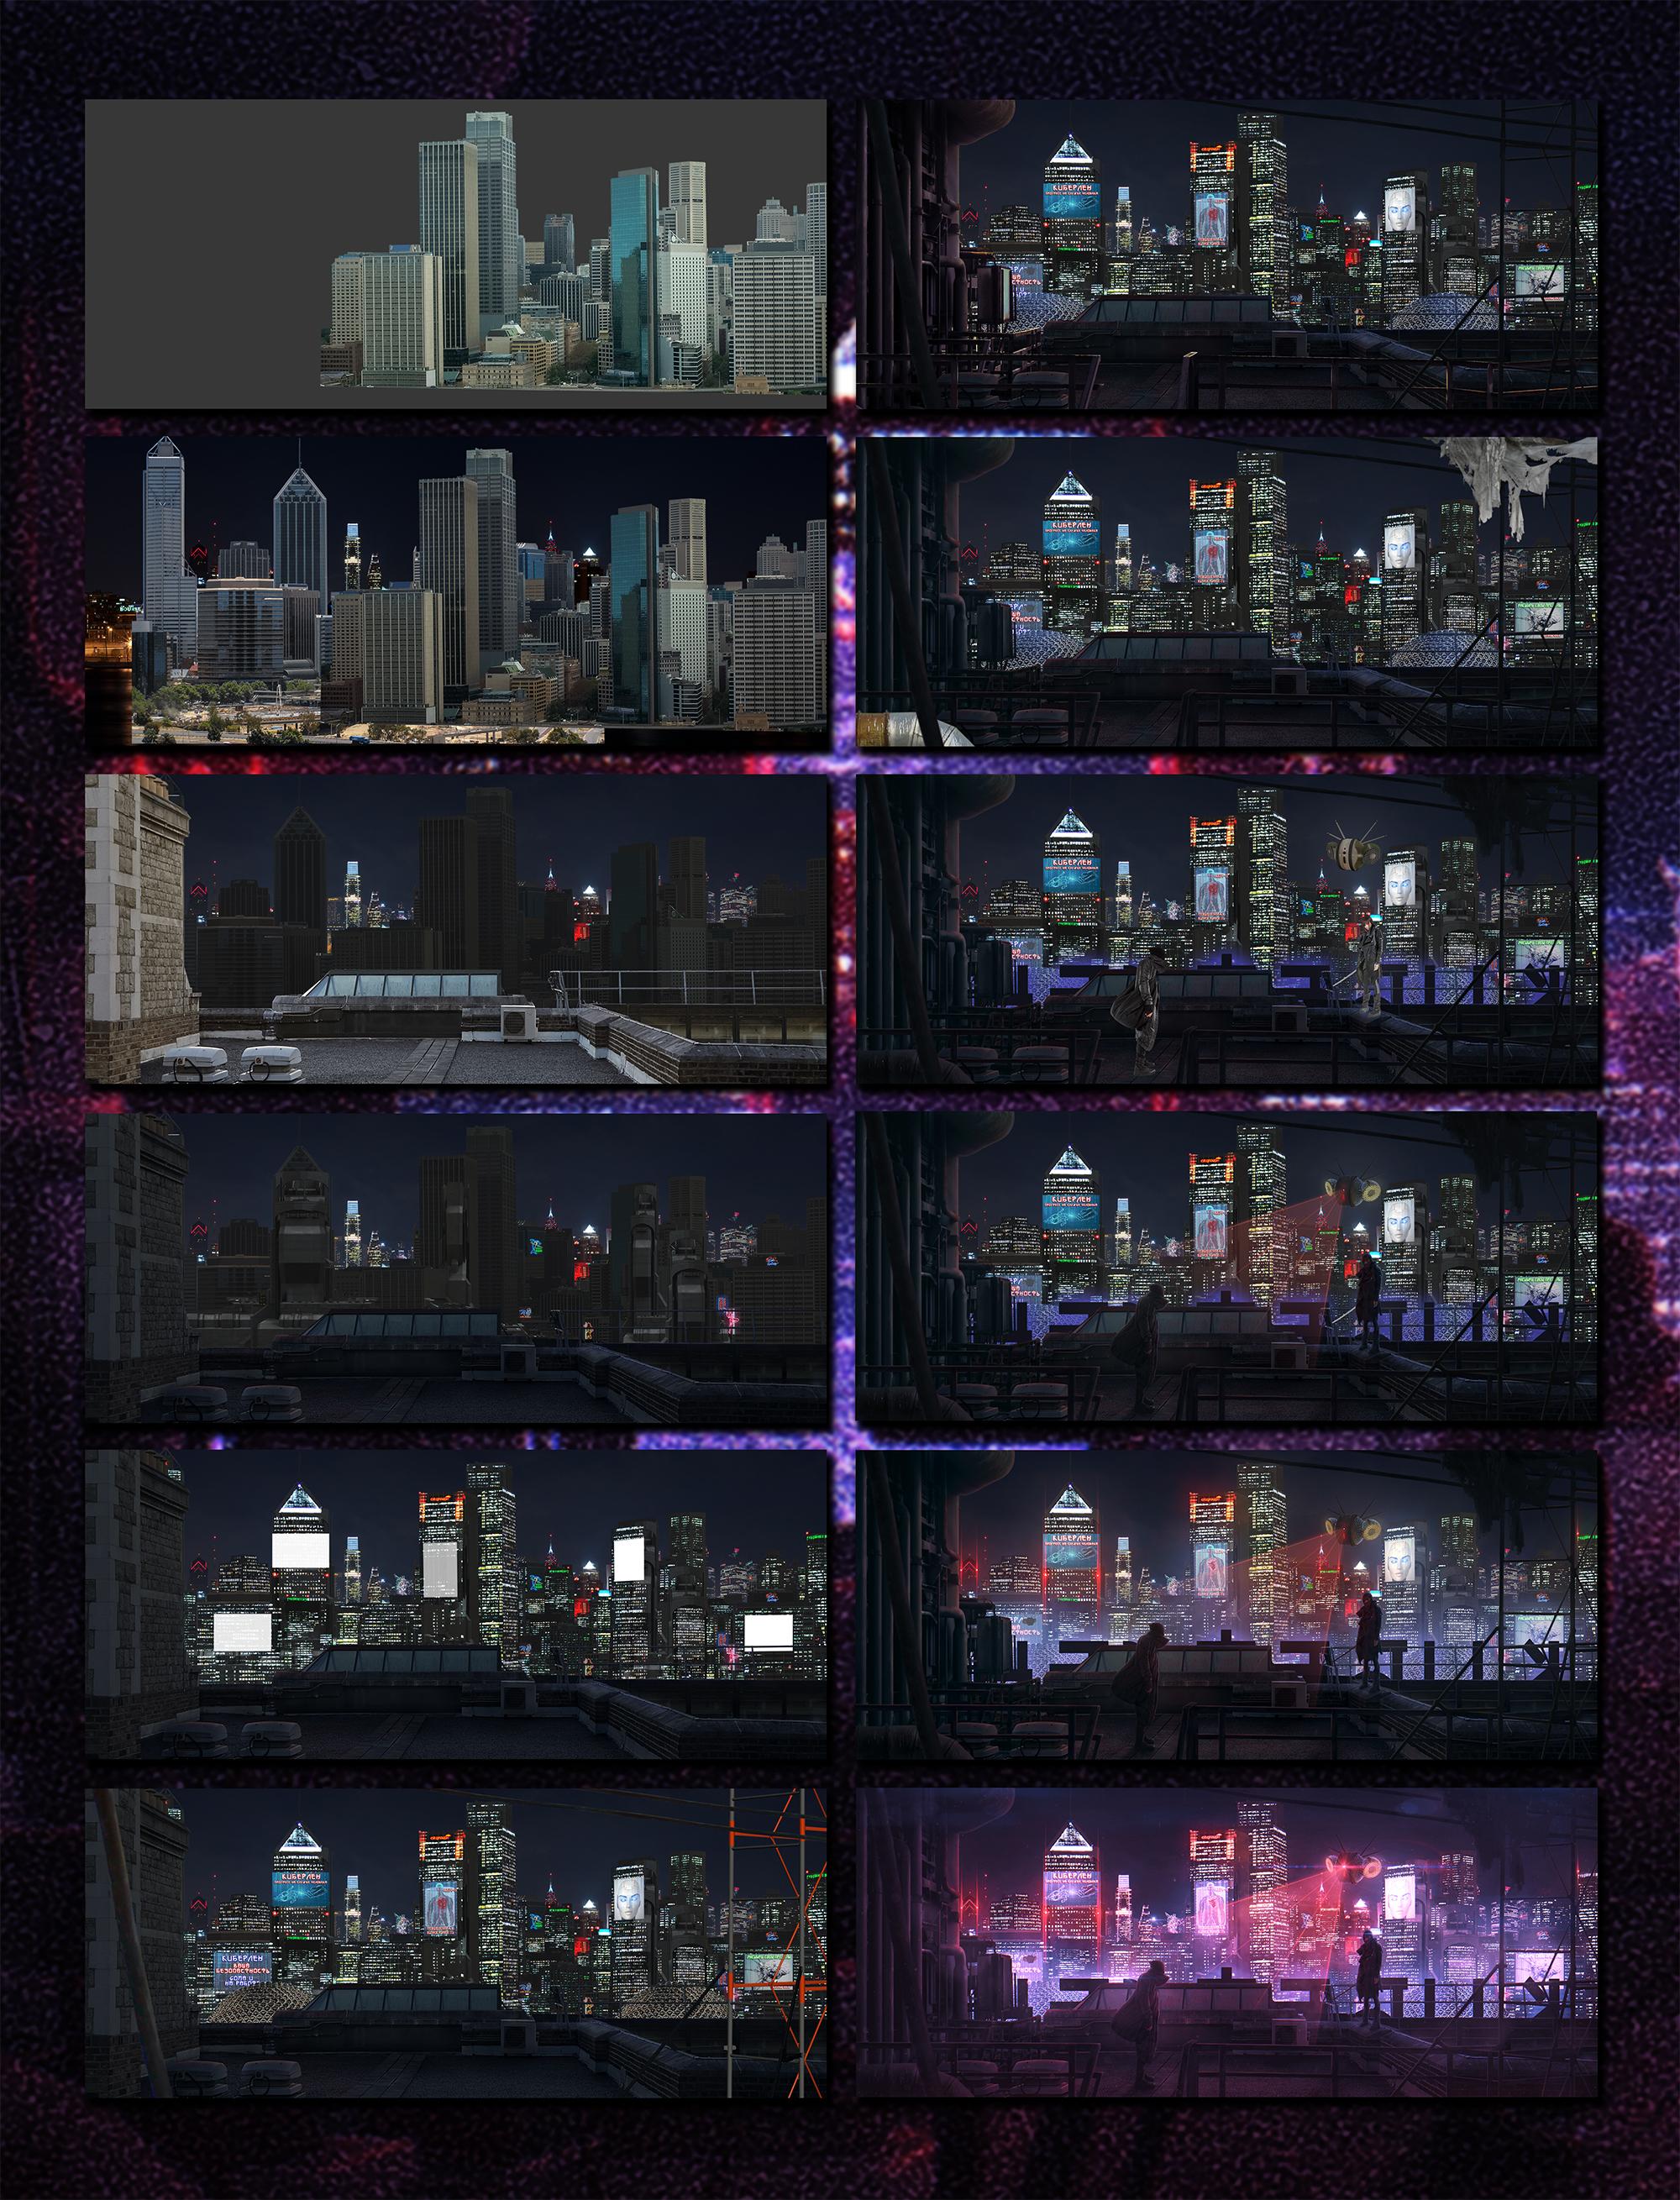 Cybercity Illustrations by Evgenij Kungur